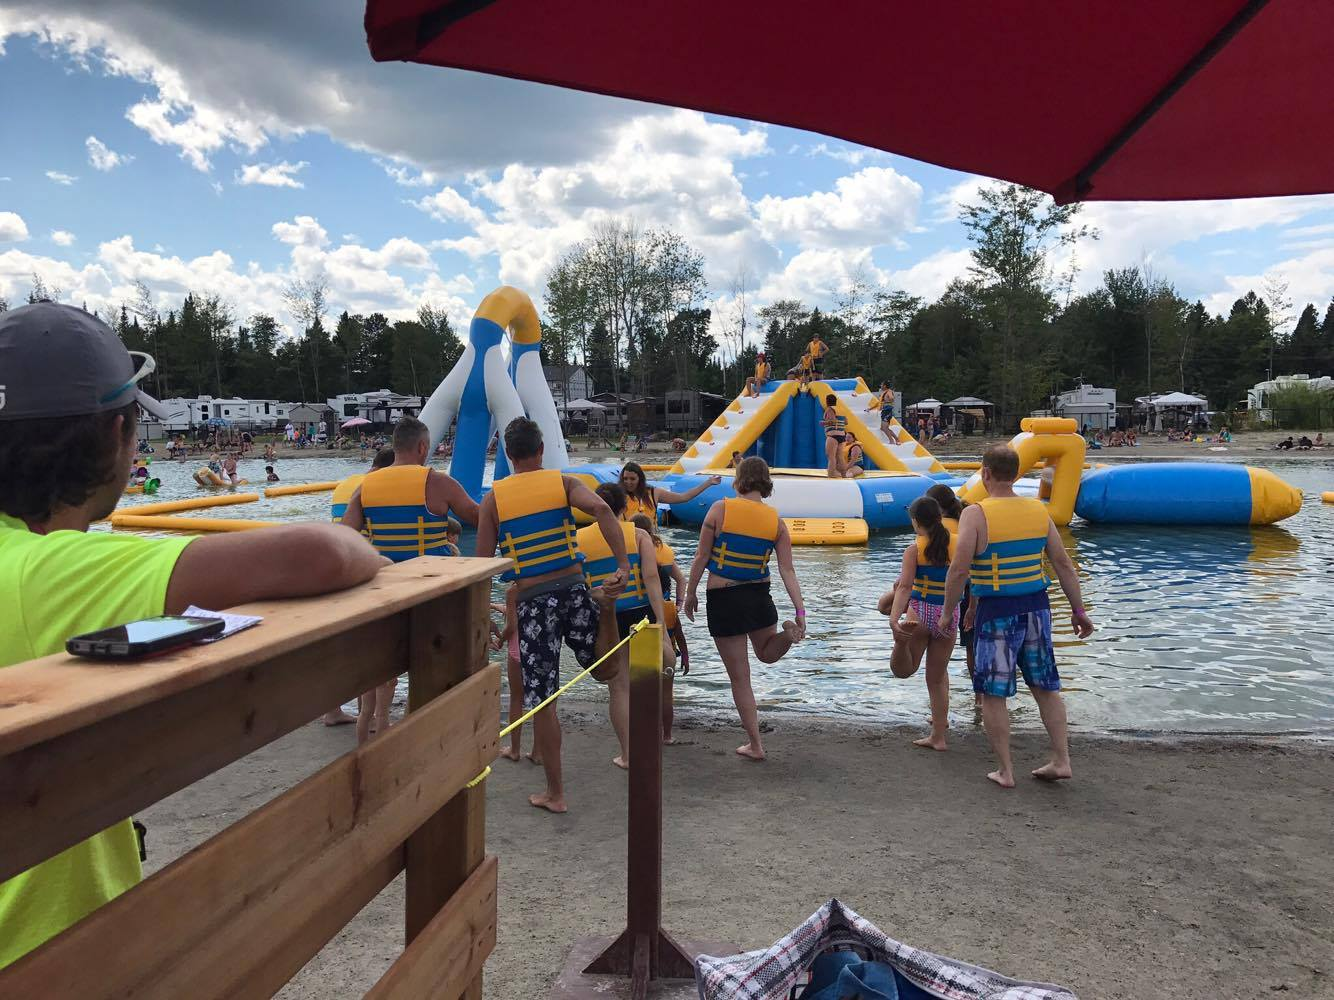 http://www.campingatlantide.com/wp-content/uploads/2018/01/beach-party-2017-complexe-atlantide-13.jpg